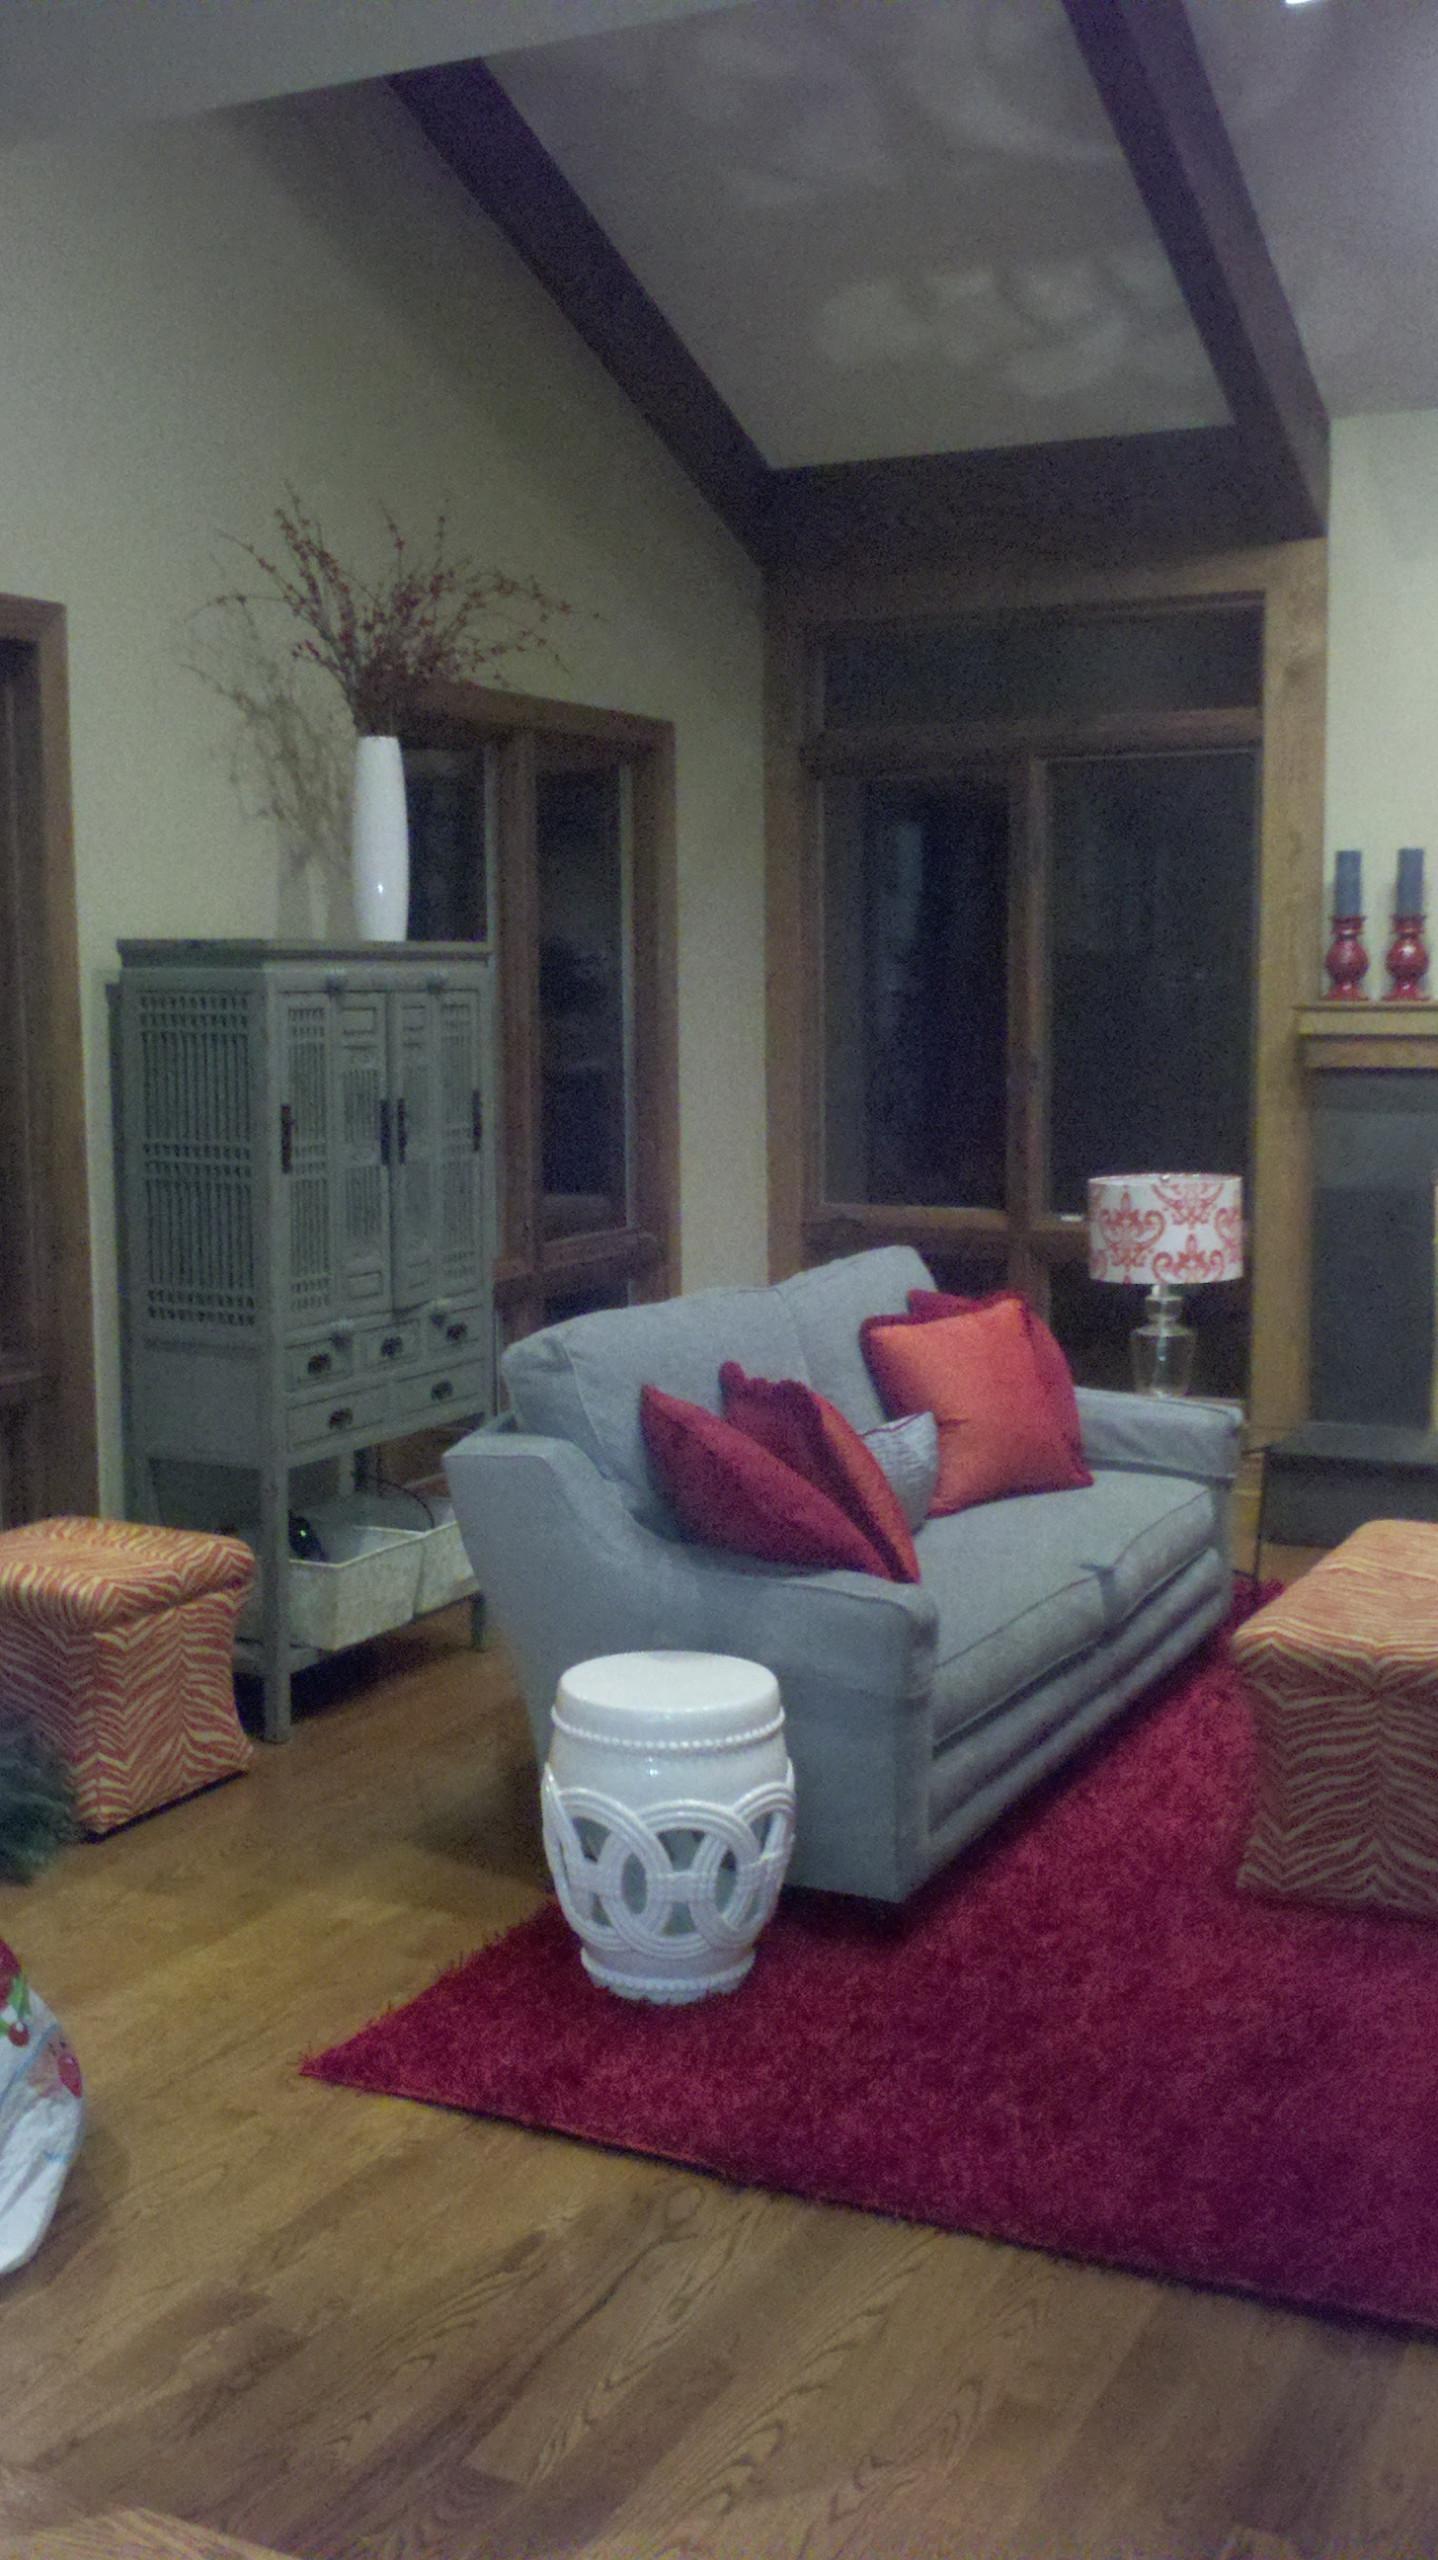 living room based on red, orange, blue paisley print, red shag rug, antiques